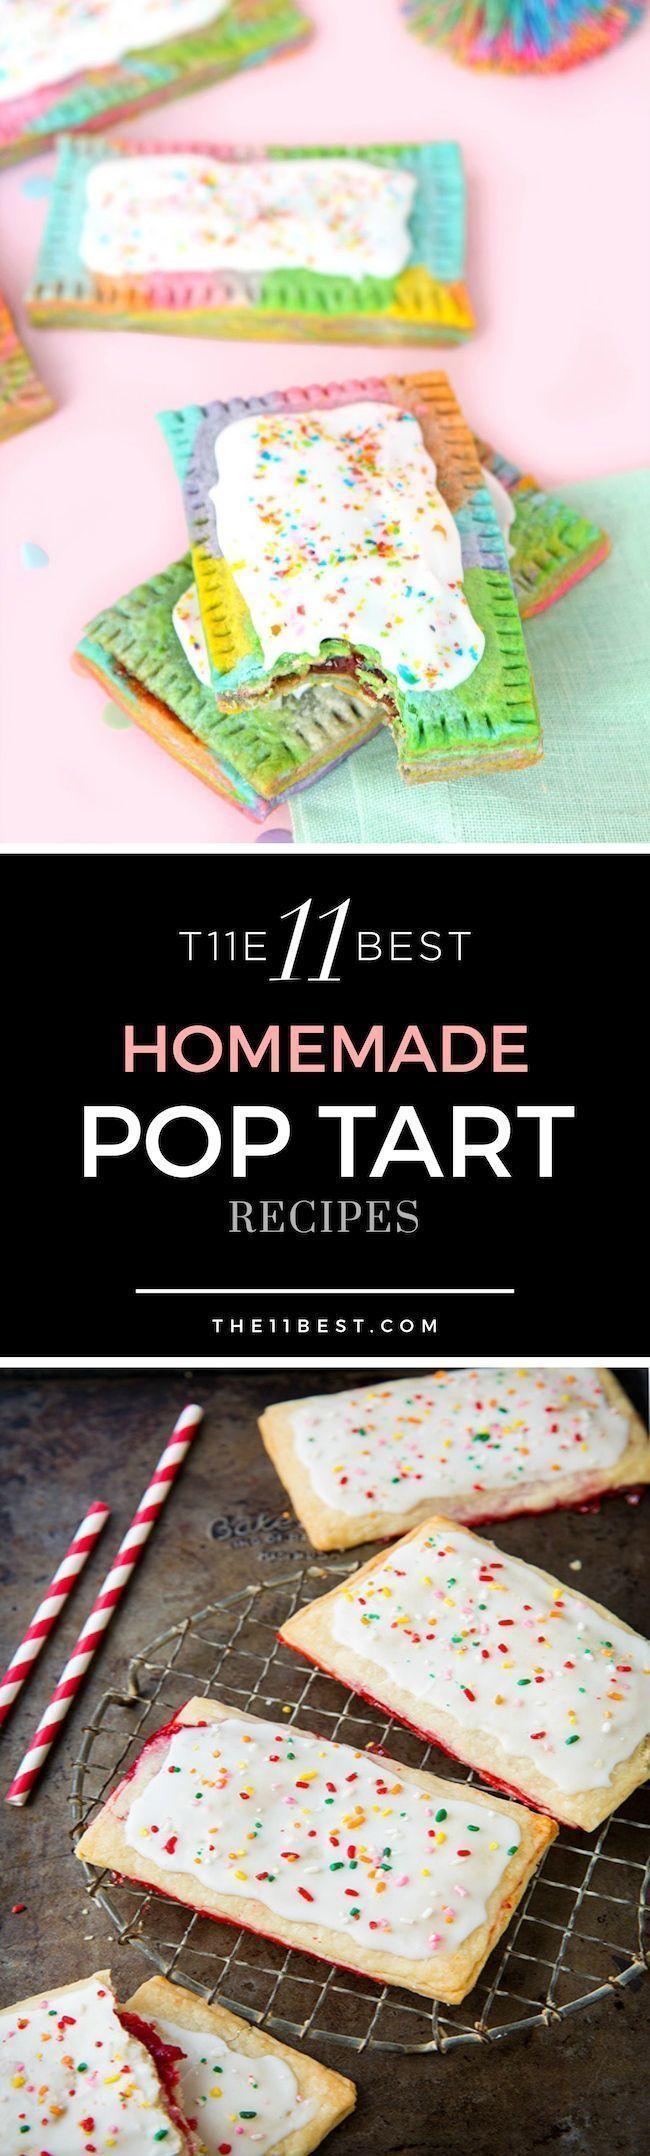 Homemade pop tart recipes. How to make pop tarts.